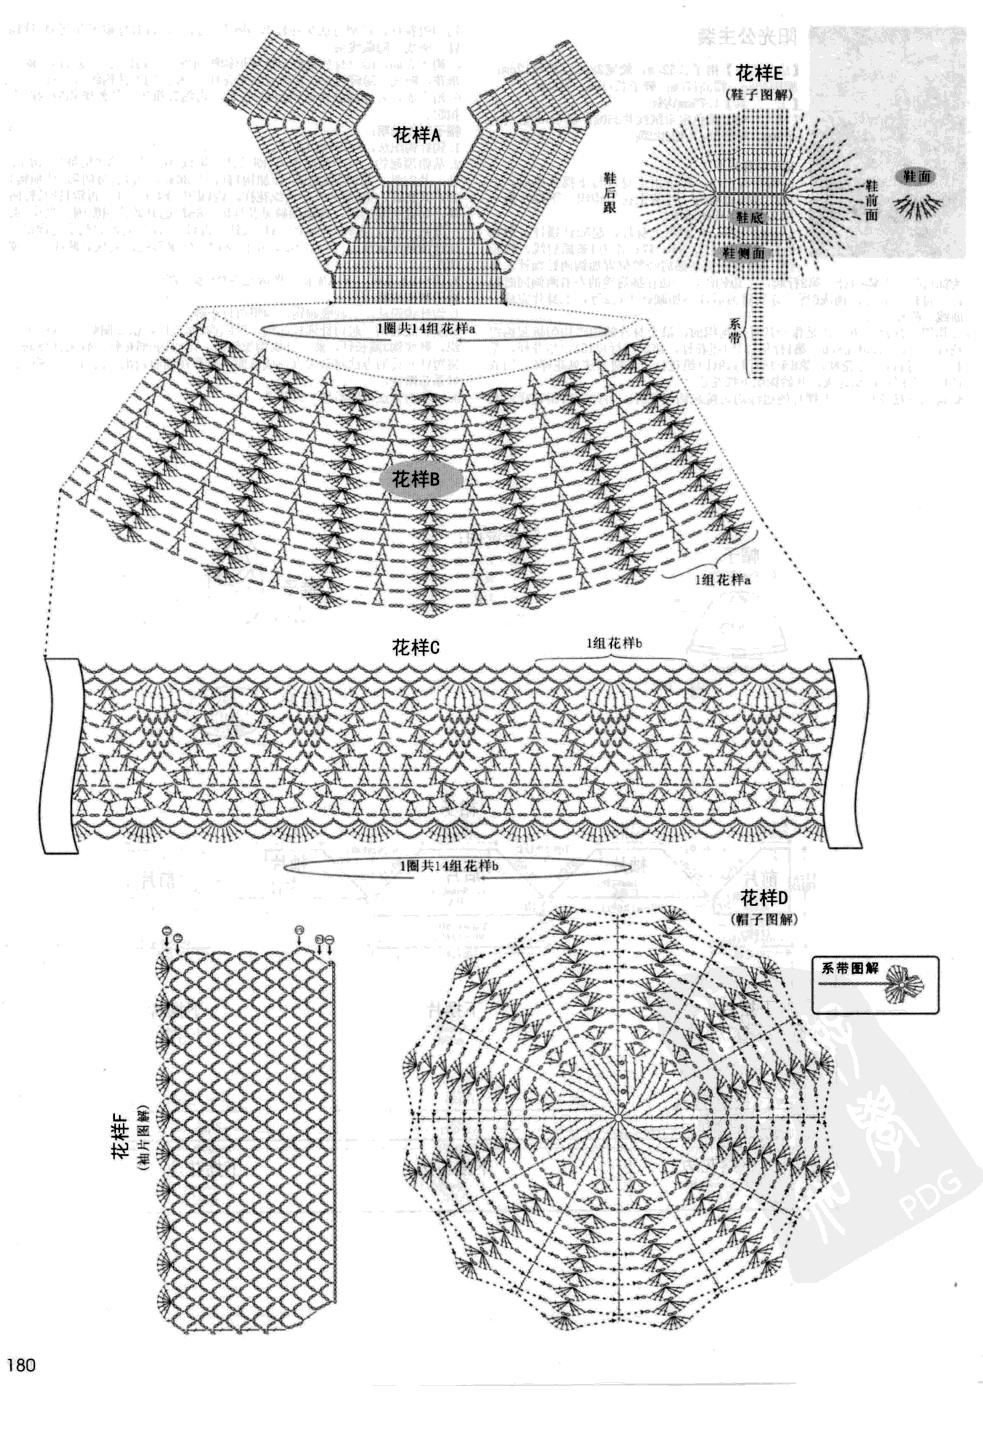 p (180).jpg